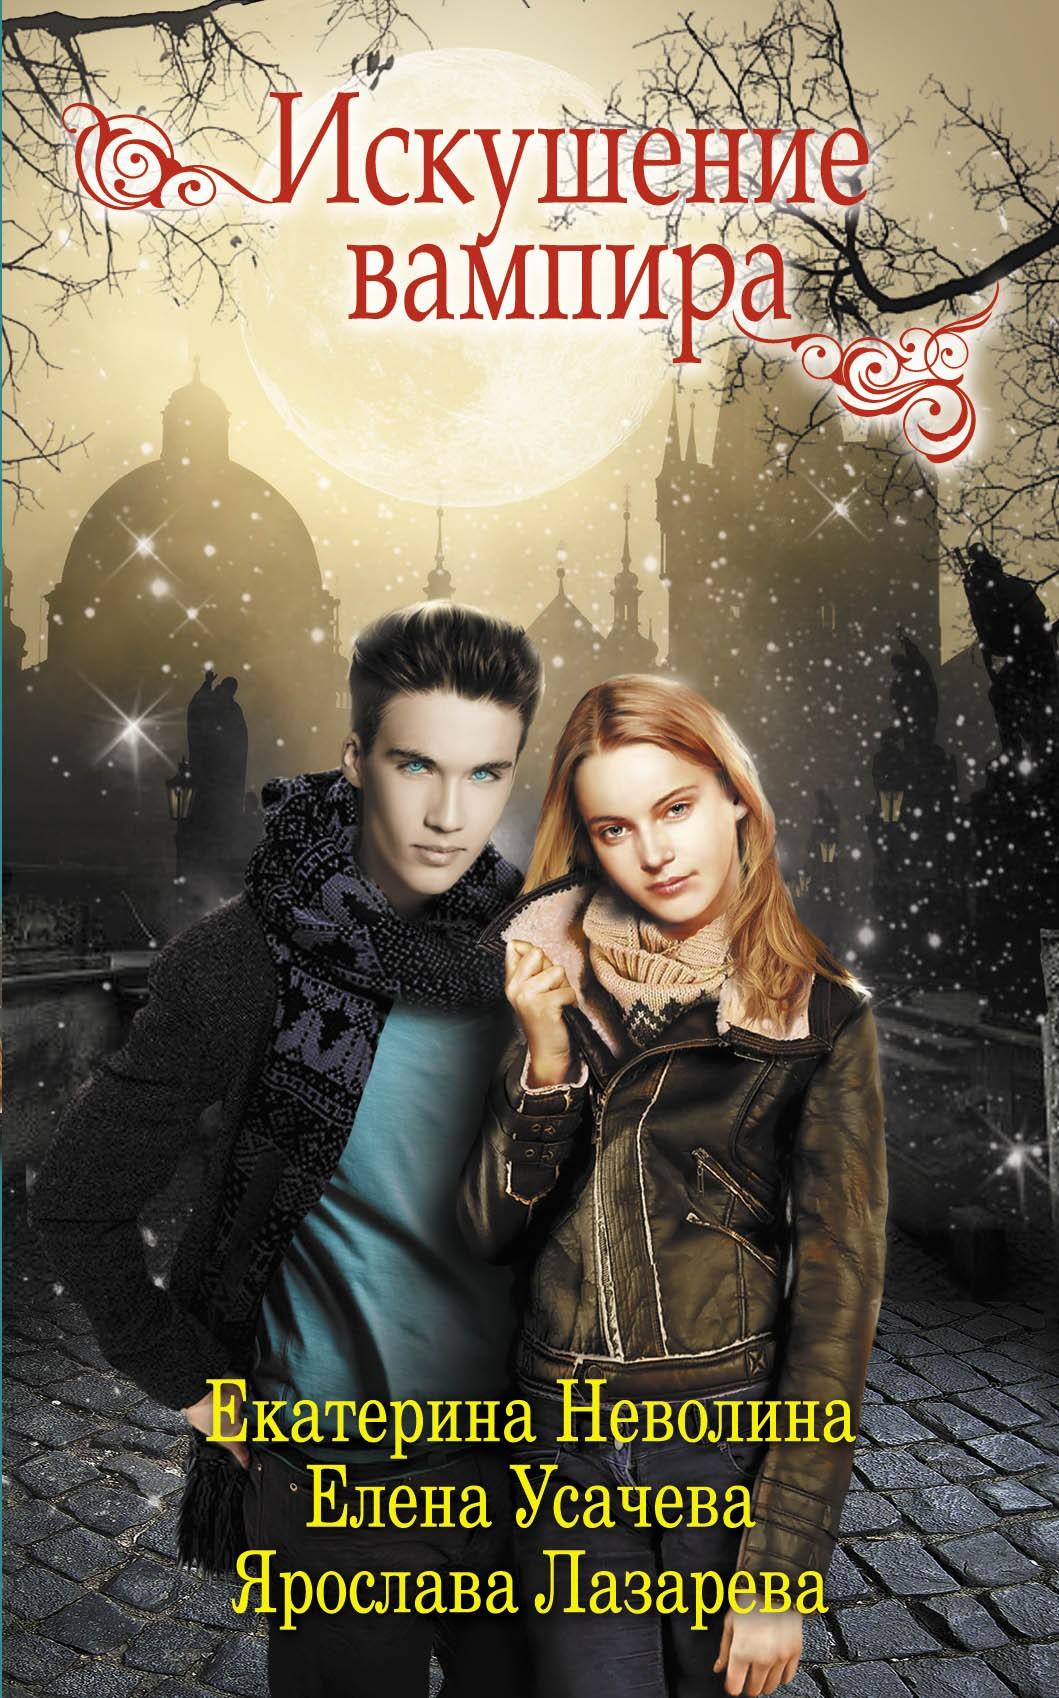 Елена Усачева Искушение вампира (сборник)